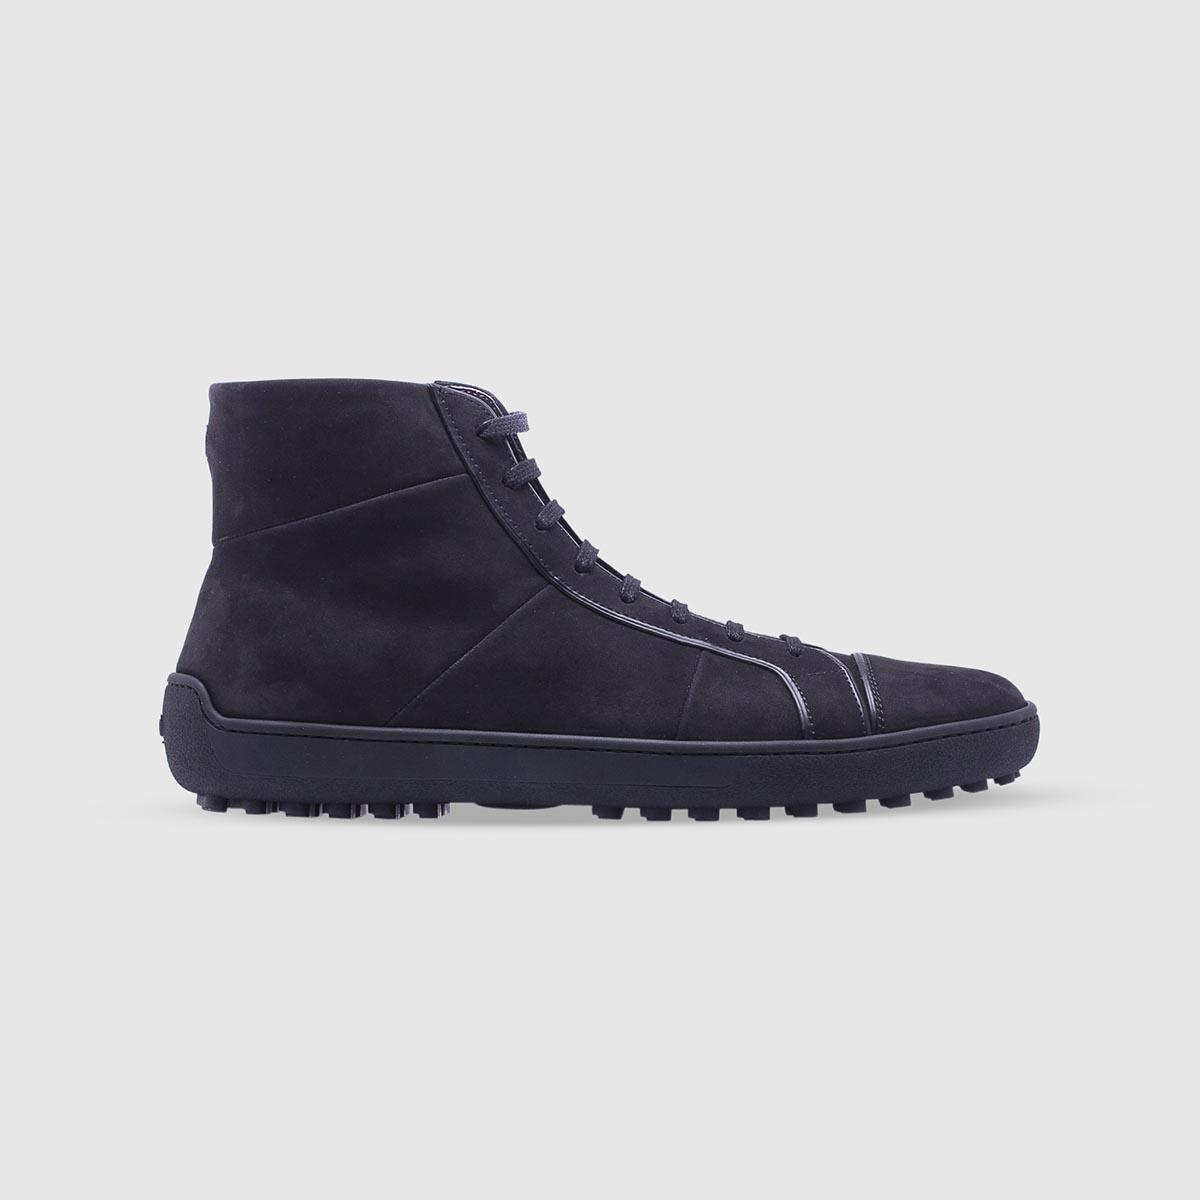 Sneaker nera in pelle di vitello nabuk